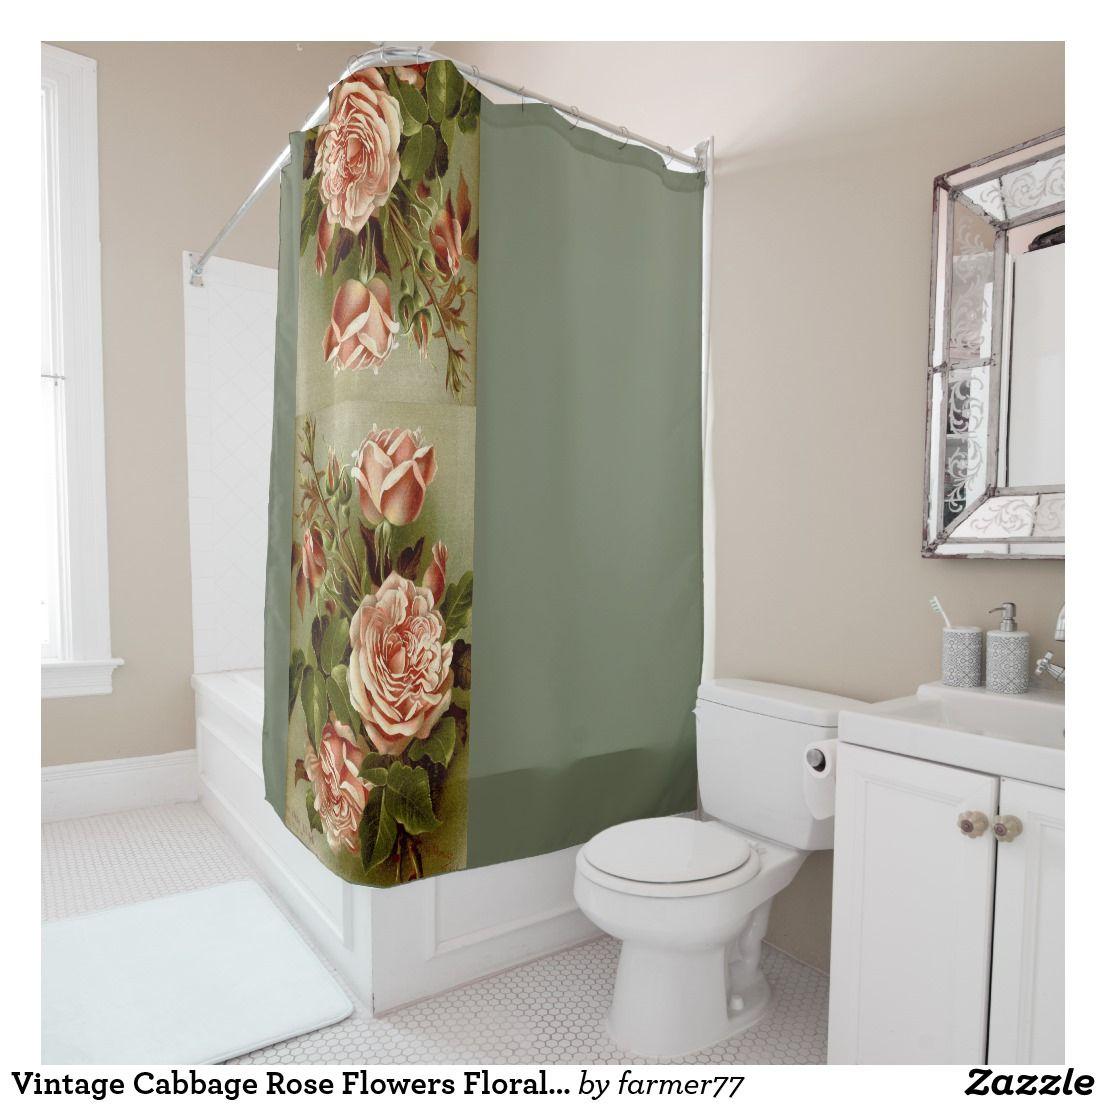 Vintage Cabbage Rose Flowers Floral Garden Shower Curtain | Bath ...